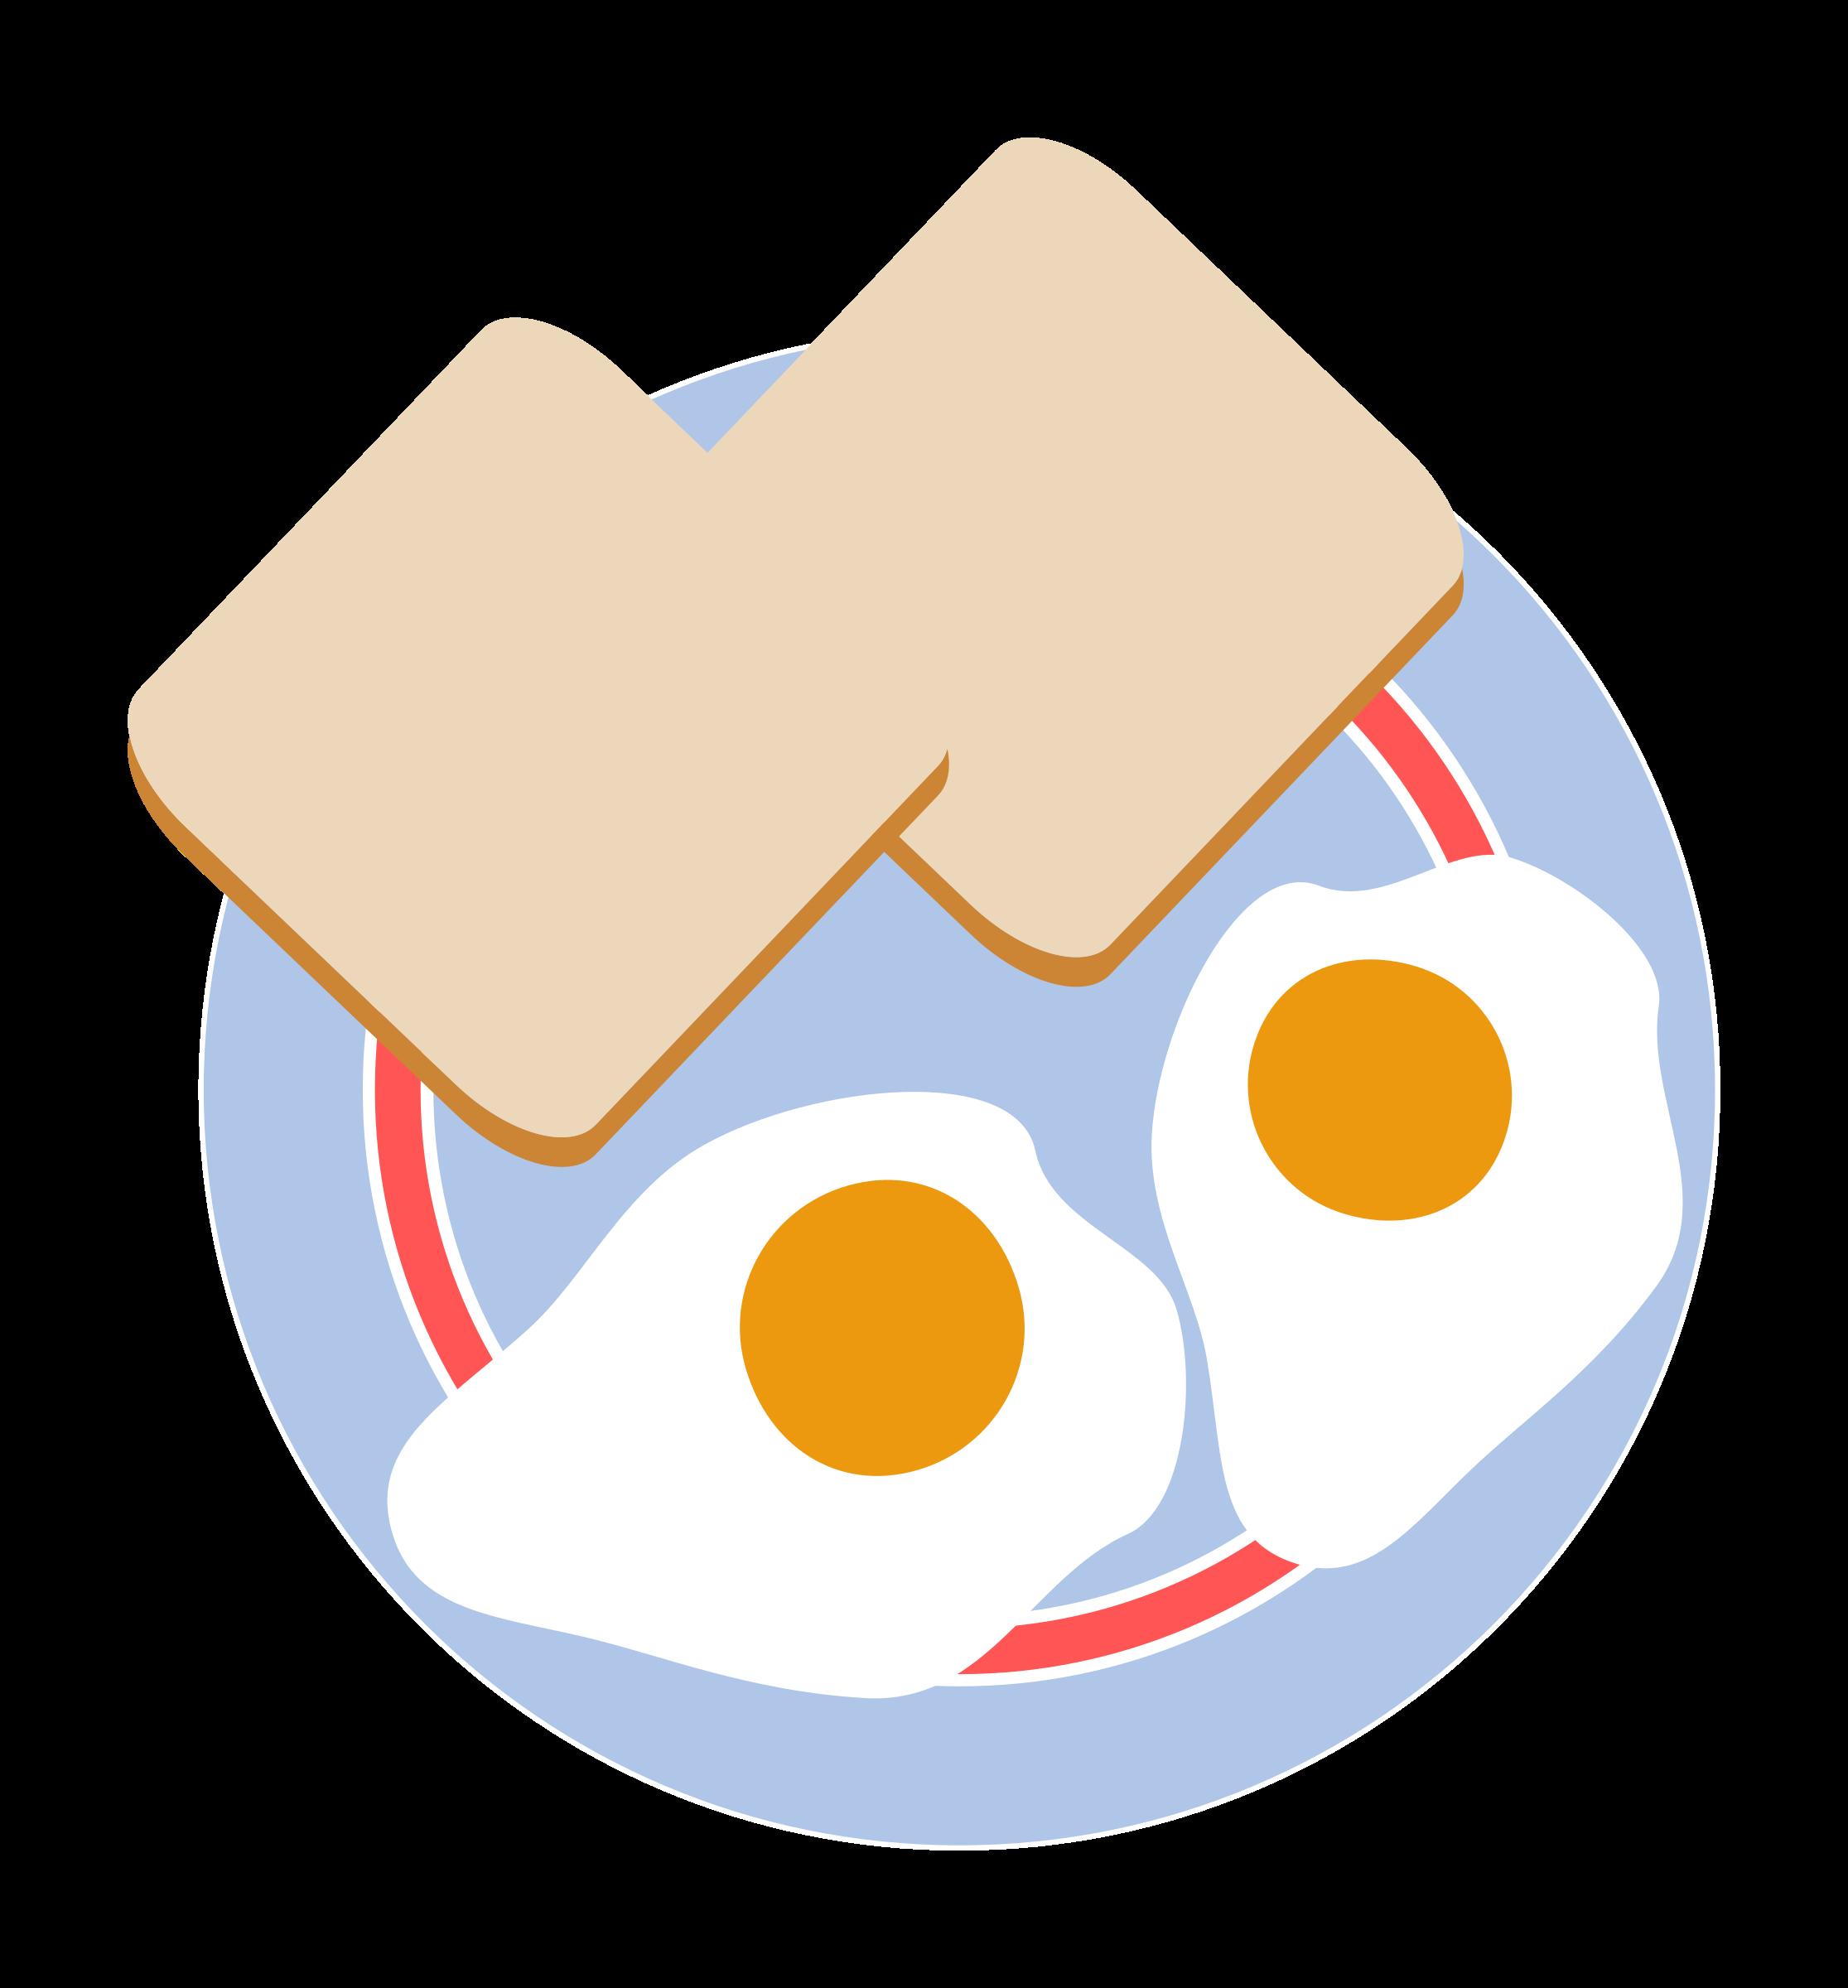 Circle clipart bread. Bull s eye eggs